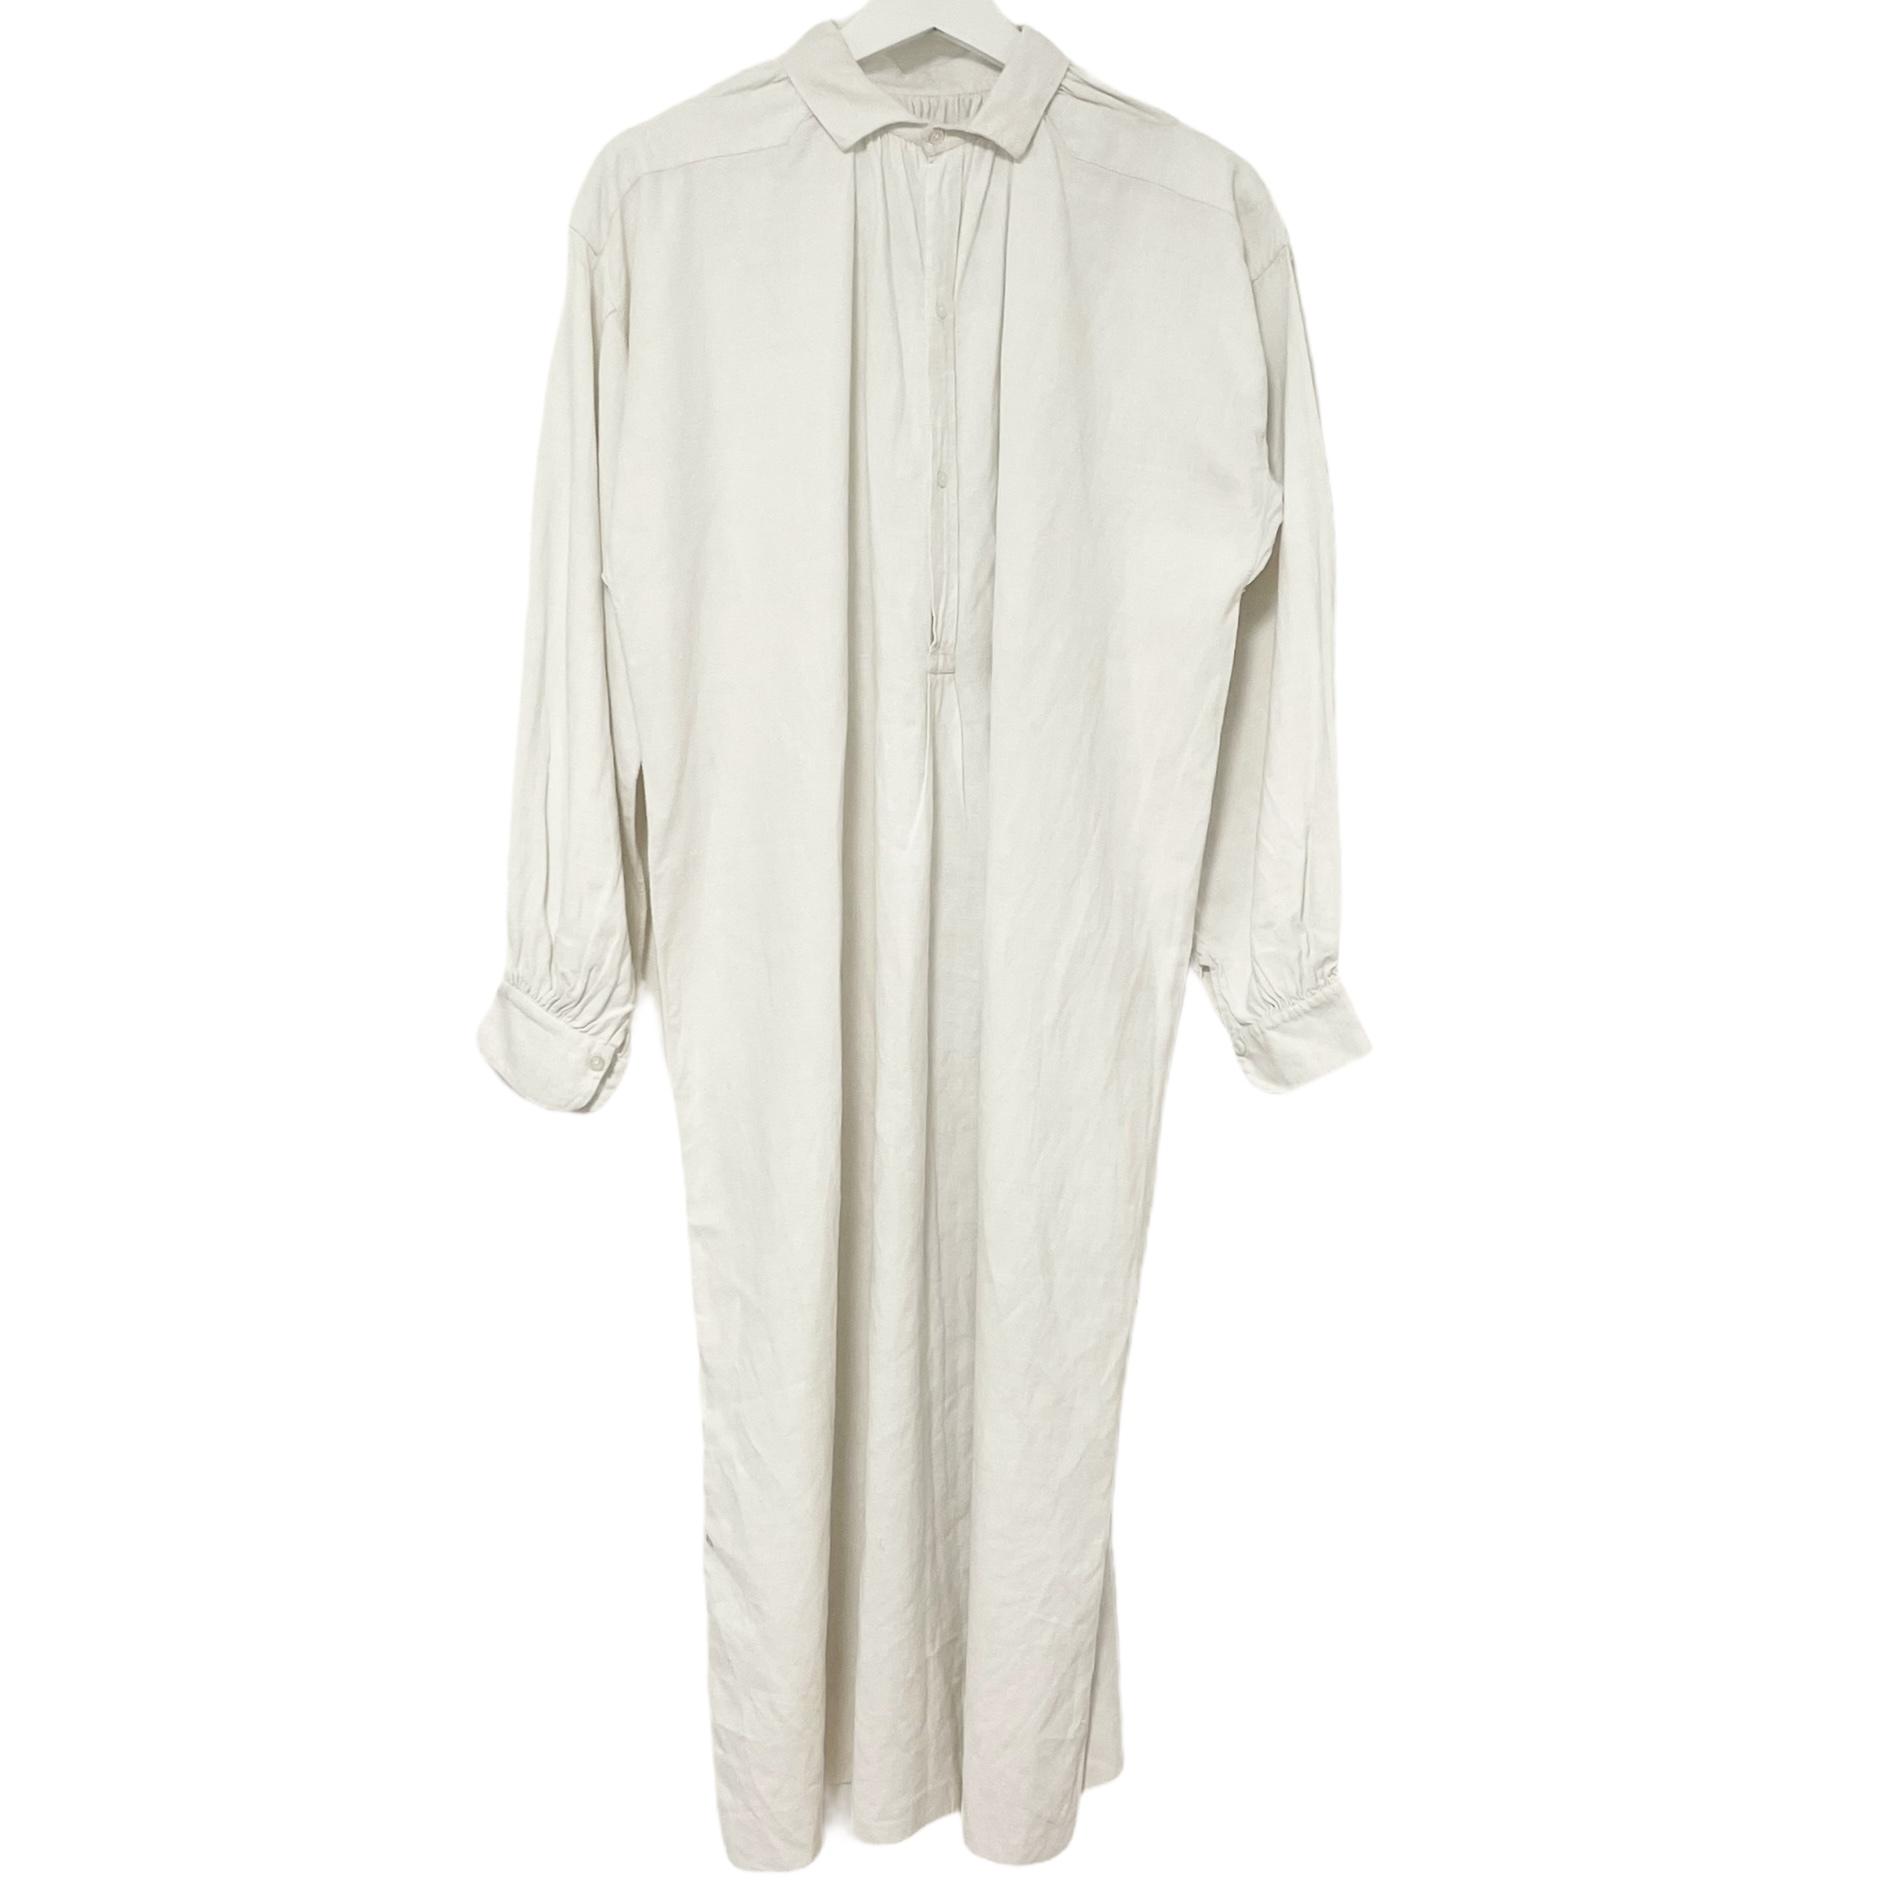 2 French Antique Linen Shirt